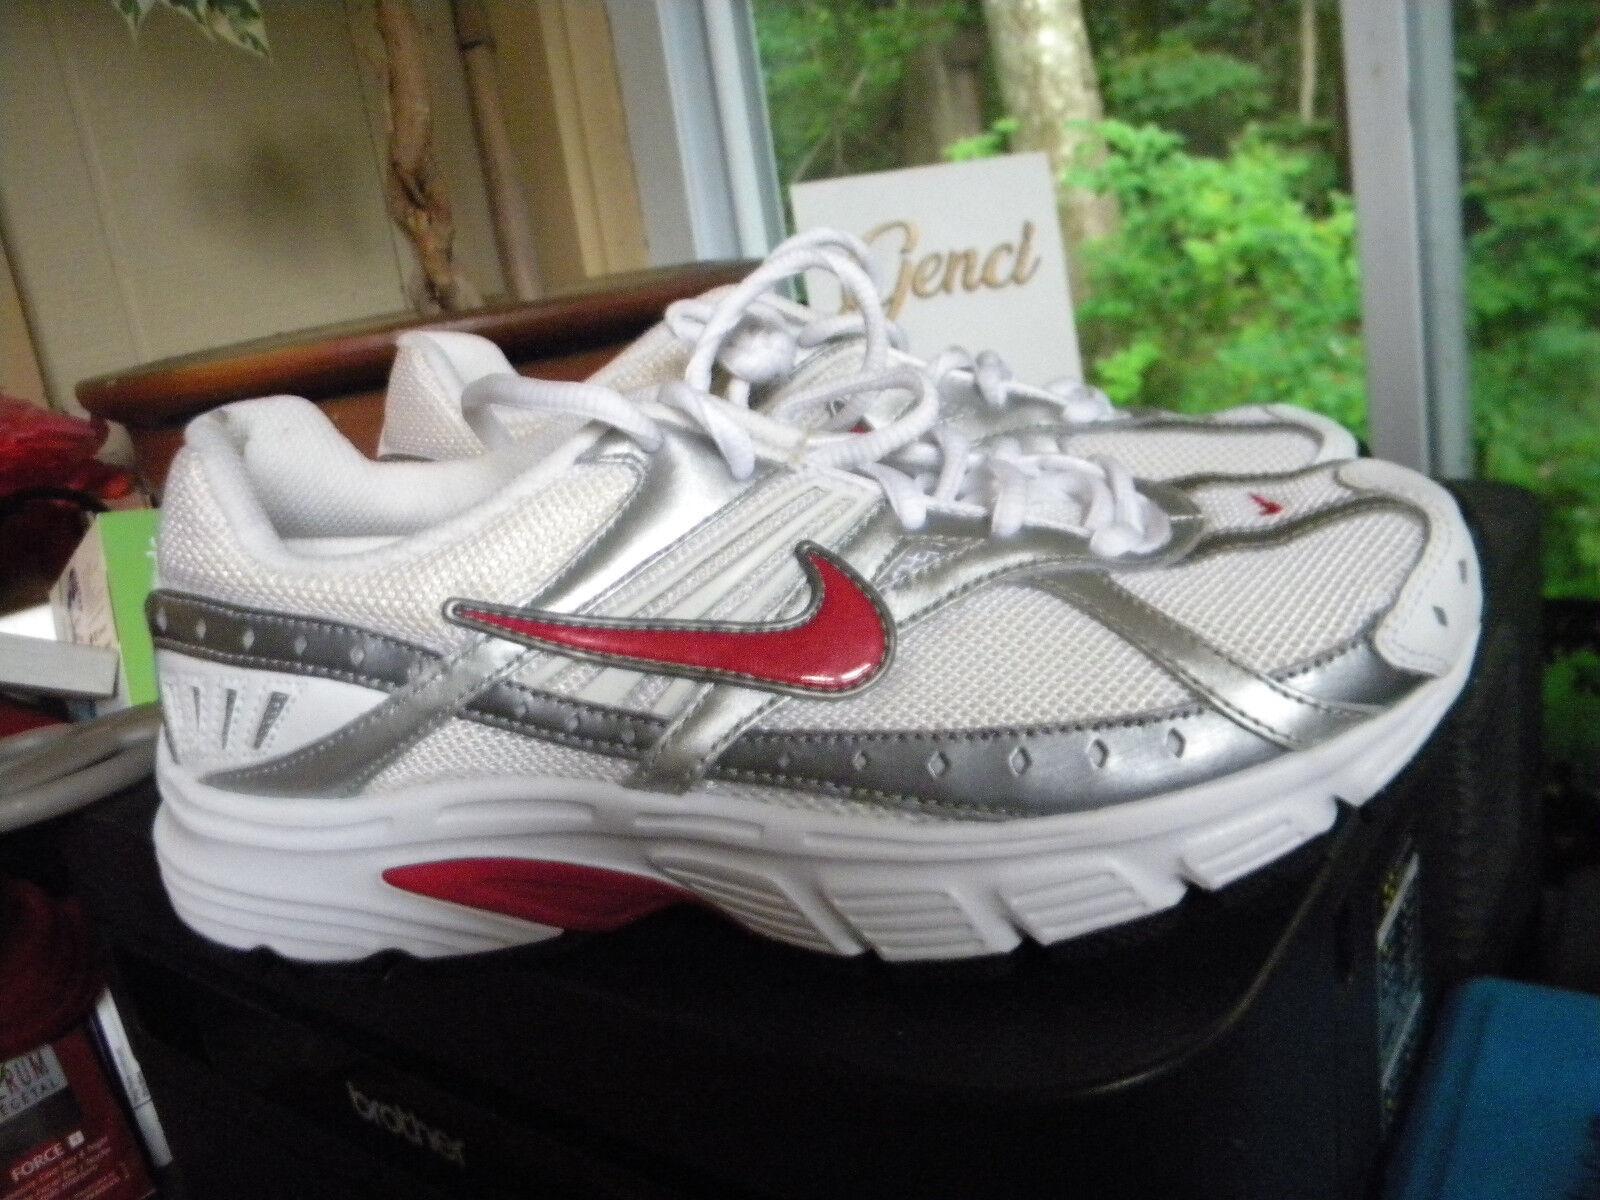 NIKE AIR Downshifter II Sz 8.5 Women's Running Shoes, Wht/Slvr Sz 8